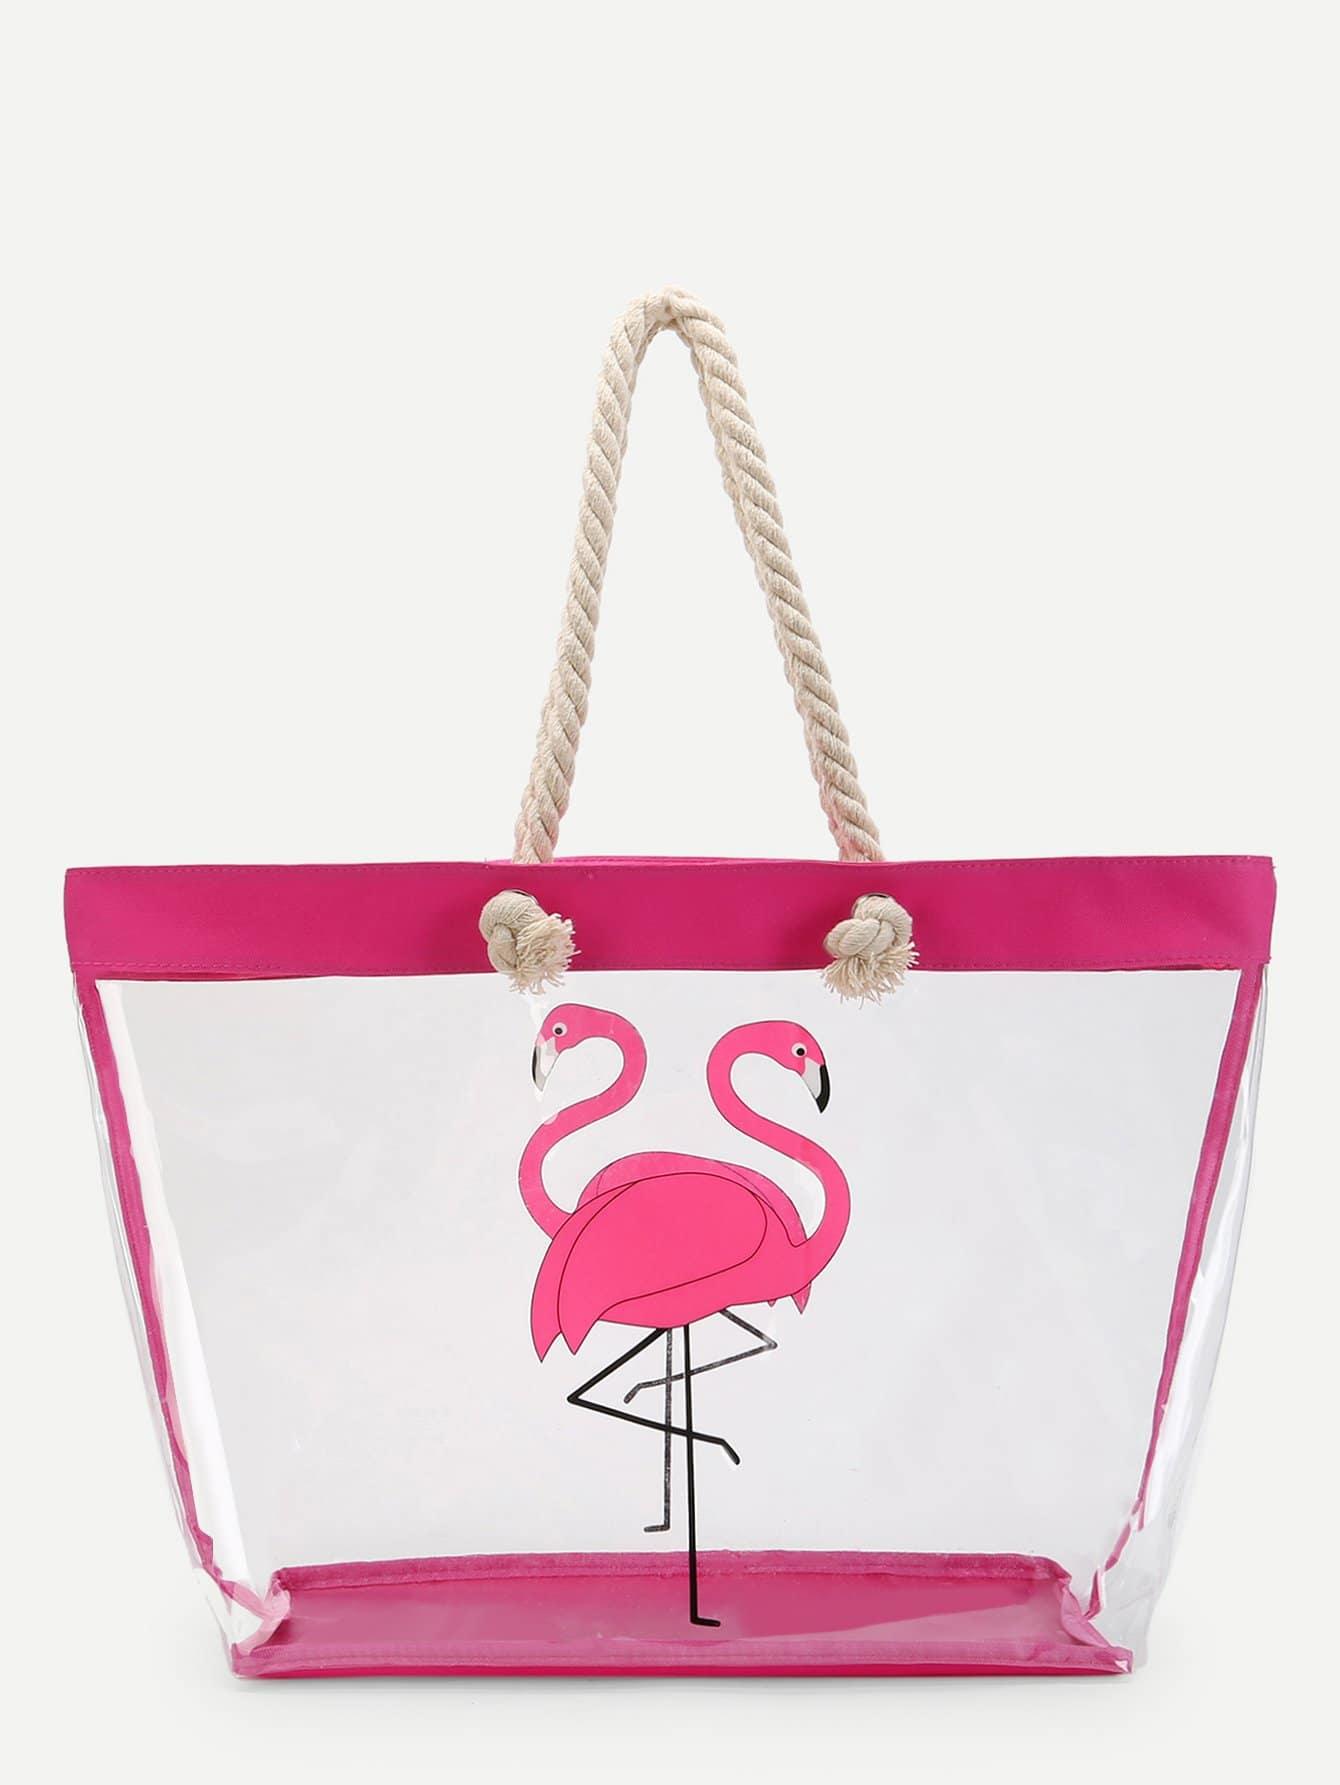 Flamingo Pattern Tote Bag straw flamingo embroidered tote bag